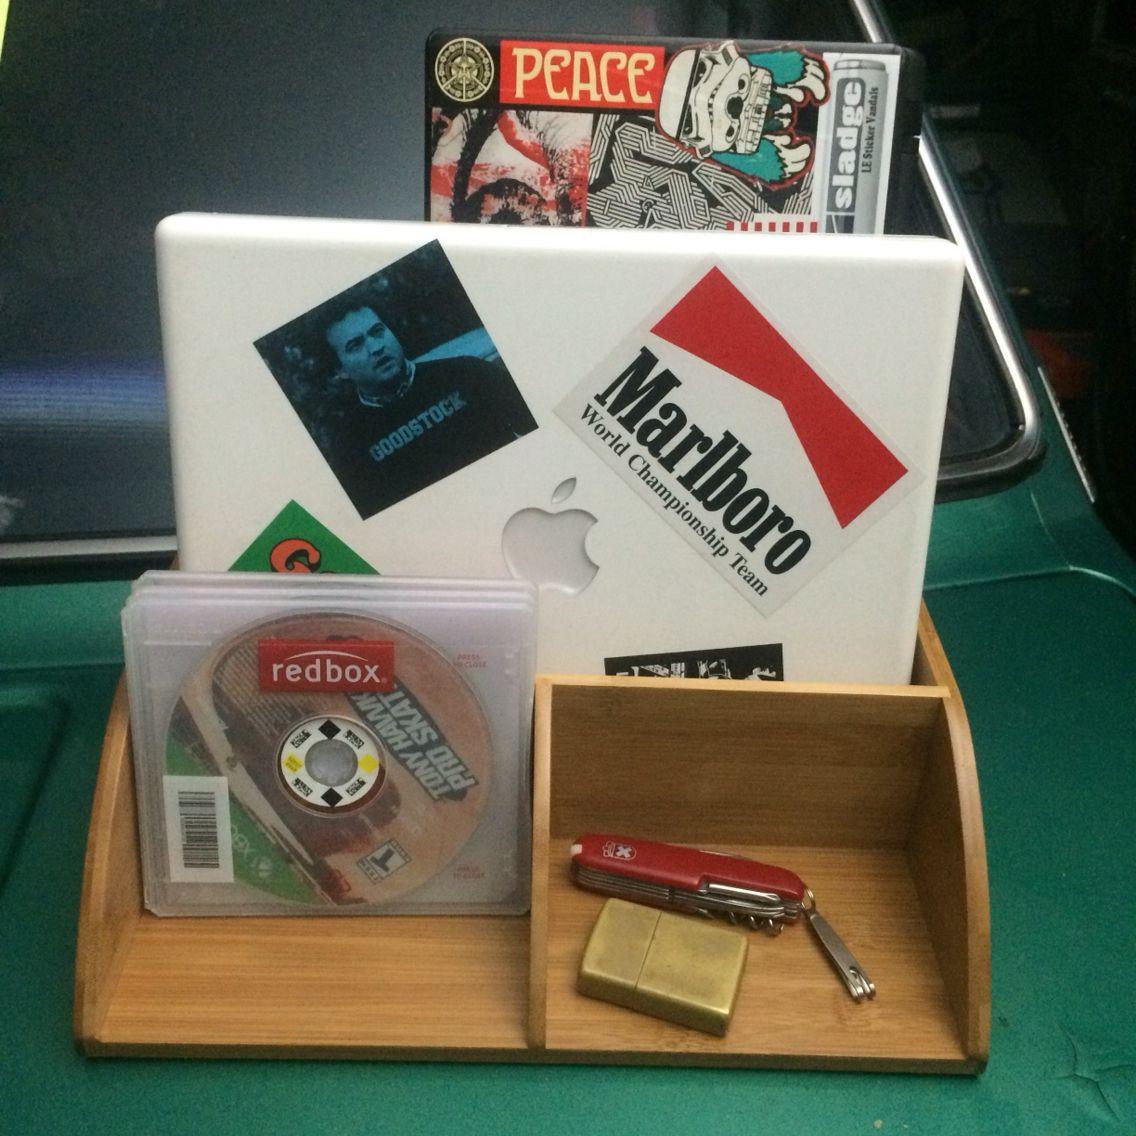 Organizer Redbox Organization Cool Stuff